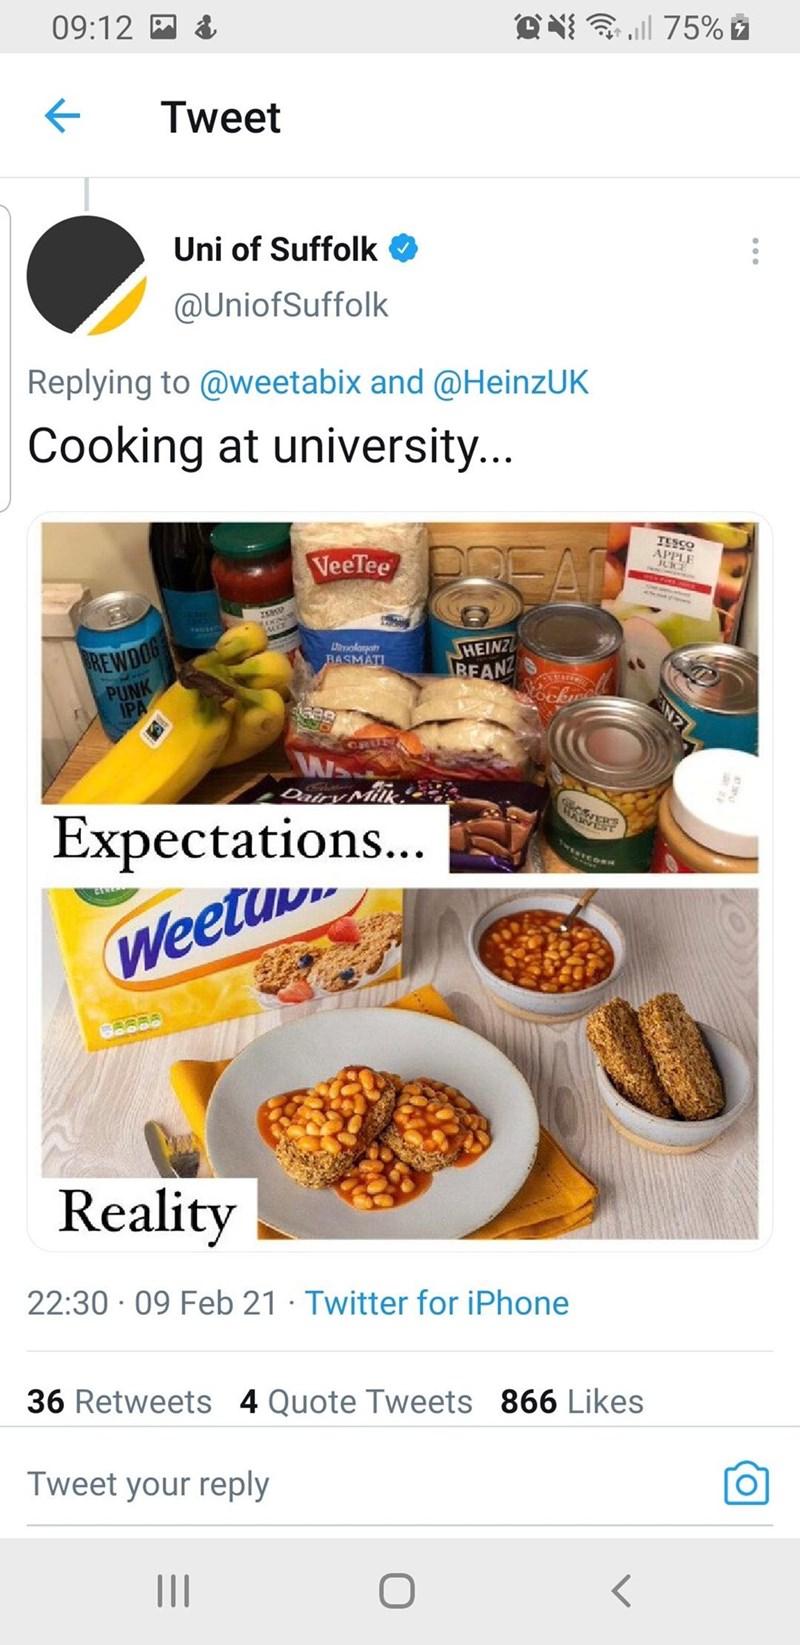 Tableware - 09:12 M Tweet Uni of Suffolk O @UniofSuffolk Replying to @weetabix and @HeinzUK Cooking at university... TESSO VeeTee APPLE JUICE IS REWDOG PUNK IPA Lhvolonan BASMATI HEINZ BEANZ CRUM Expectations... Weetin Reality 22:30 · 09 Feb 21 · Twitter for iPhone 36 Retweets 4 Quote Tweets 866 Likes Tweet your reply N2